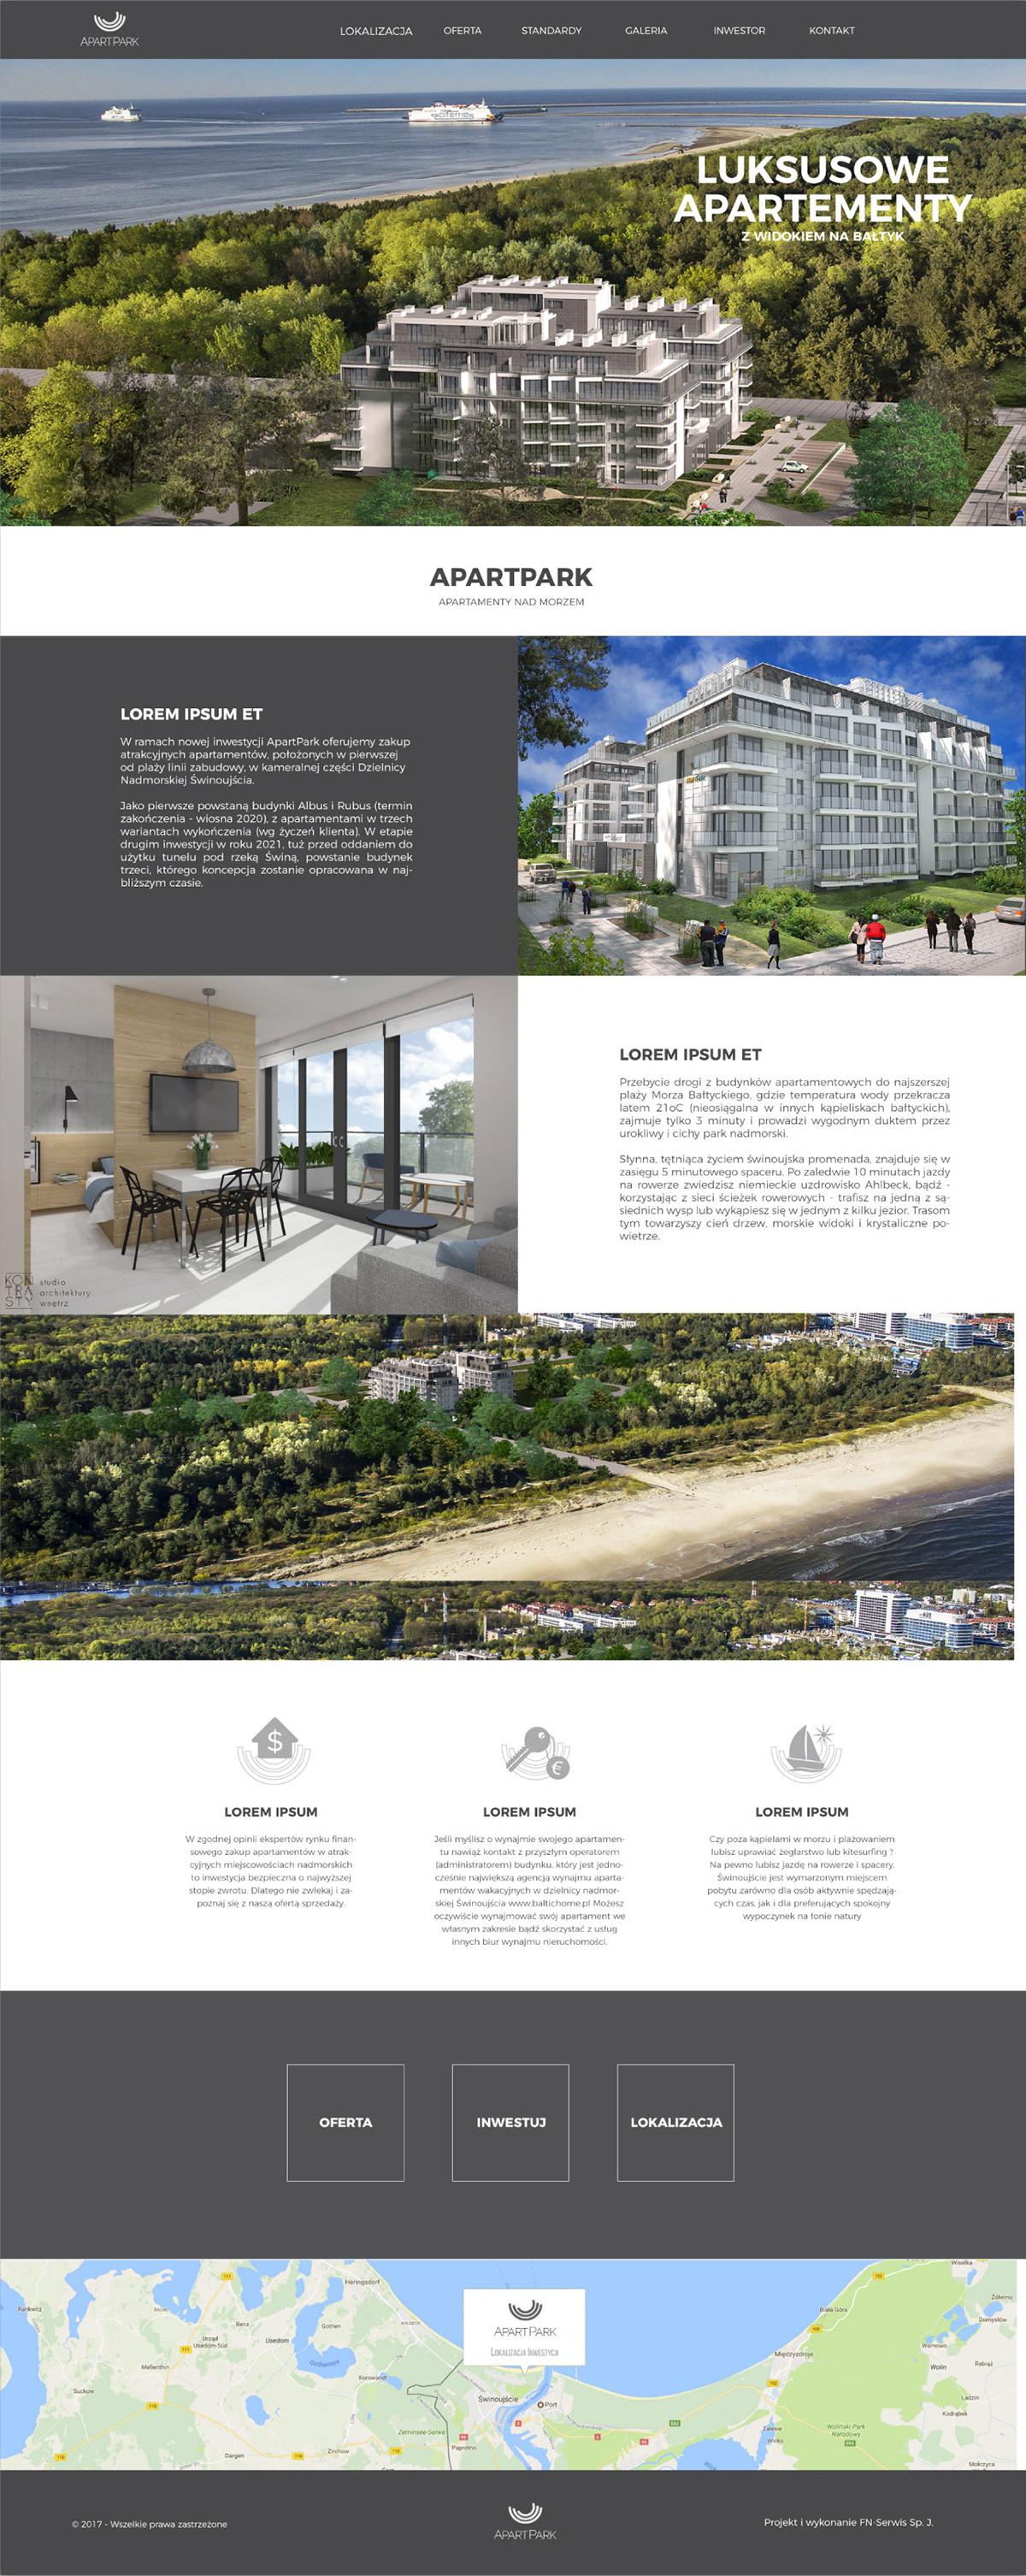 aparthotel influencer marketing construction developer real estate